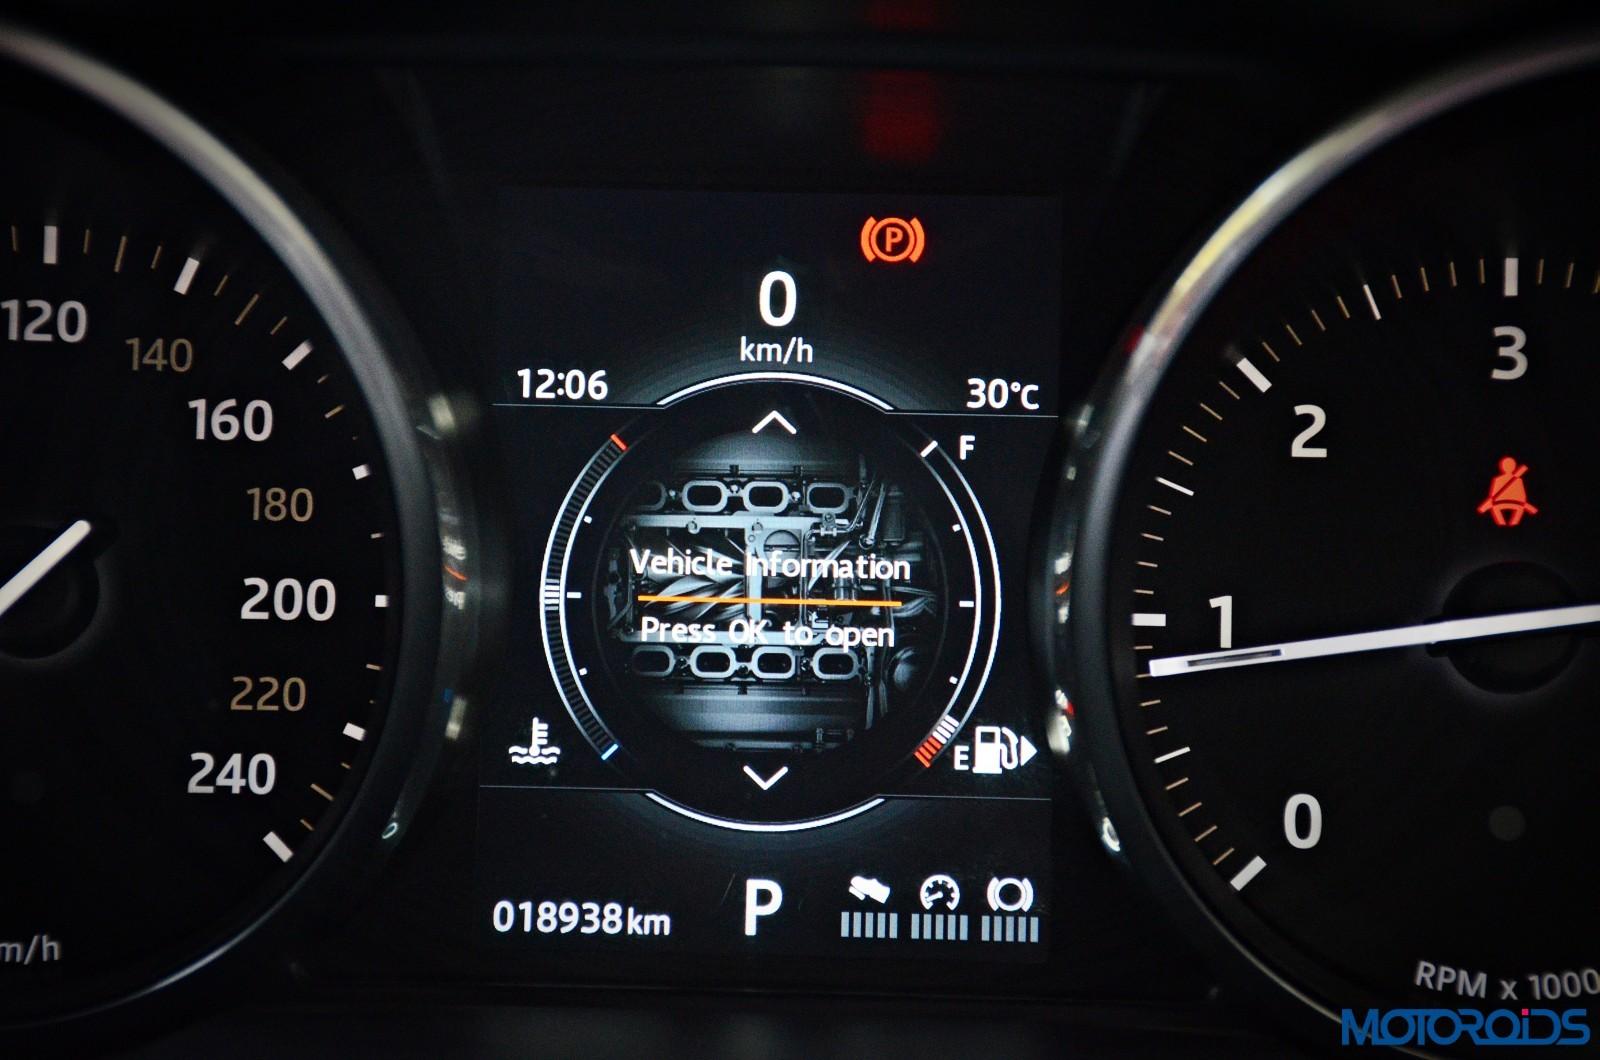 Range-Rover-Evoque-Instruments-5